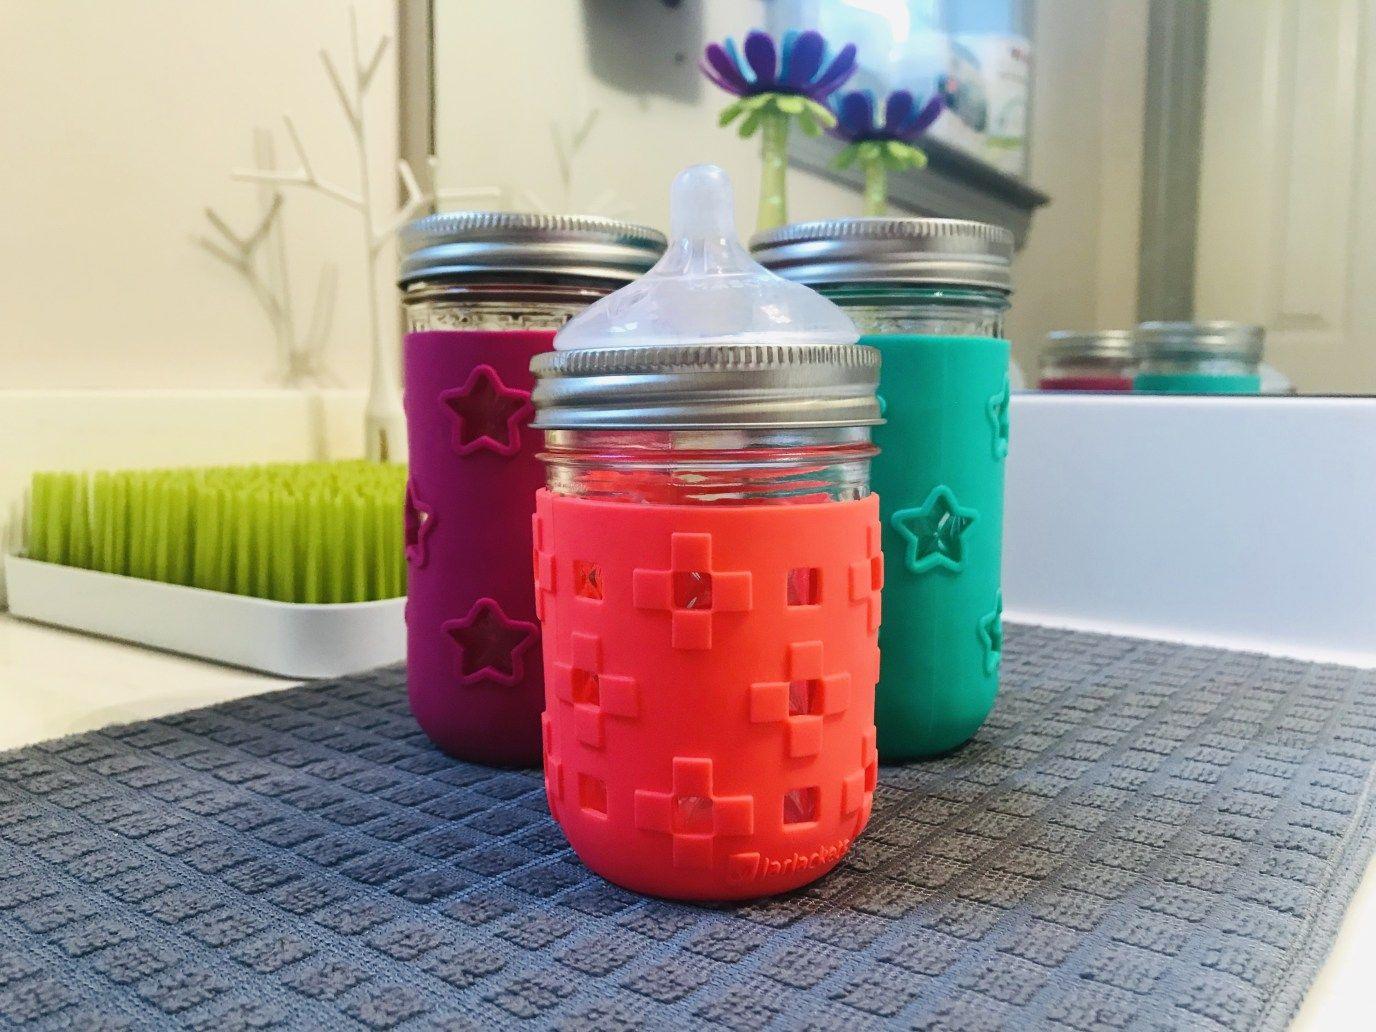 Jarjackets Silicone Sleeves For Mason Jars With Images Mason